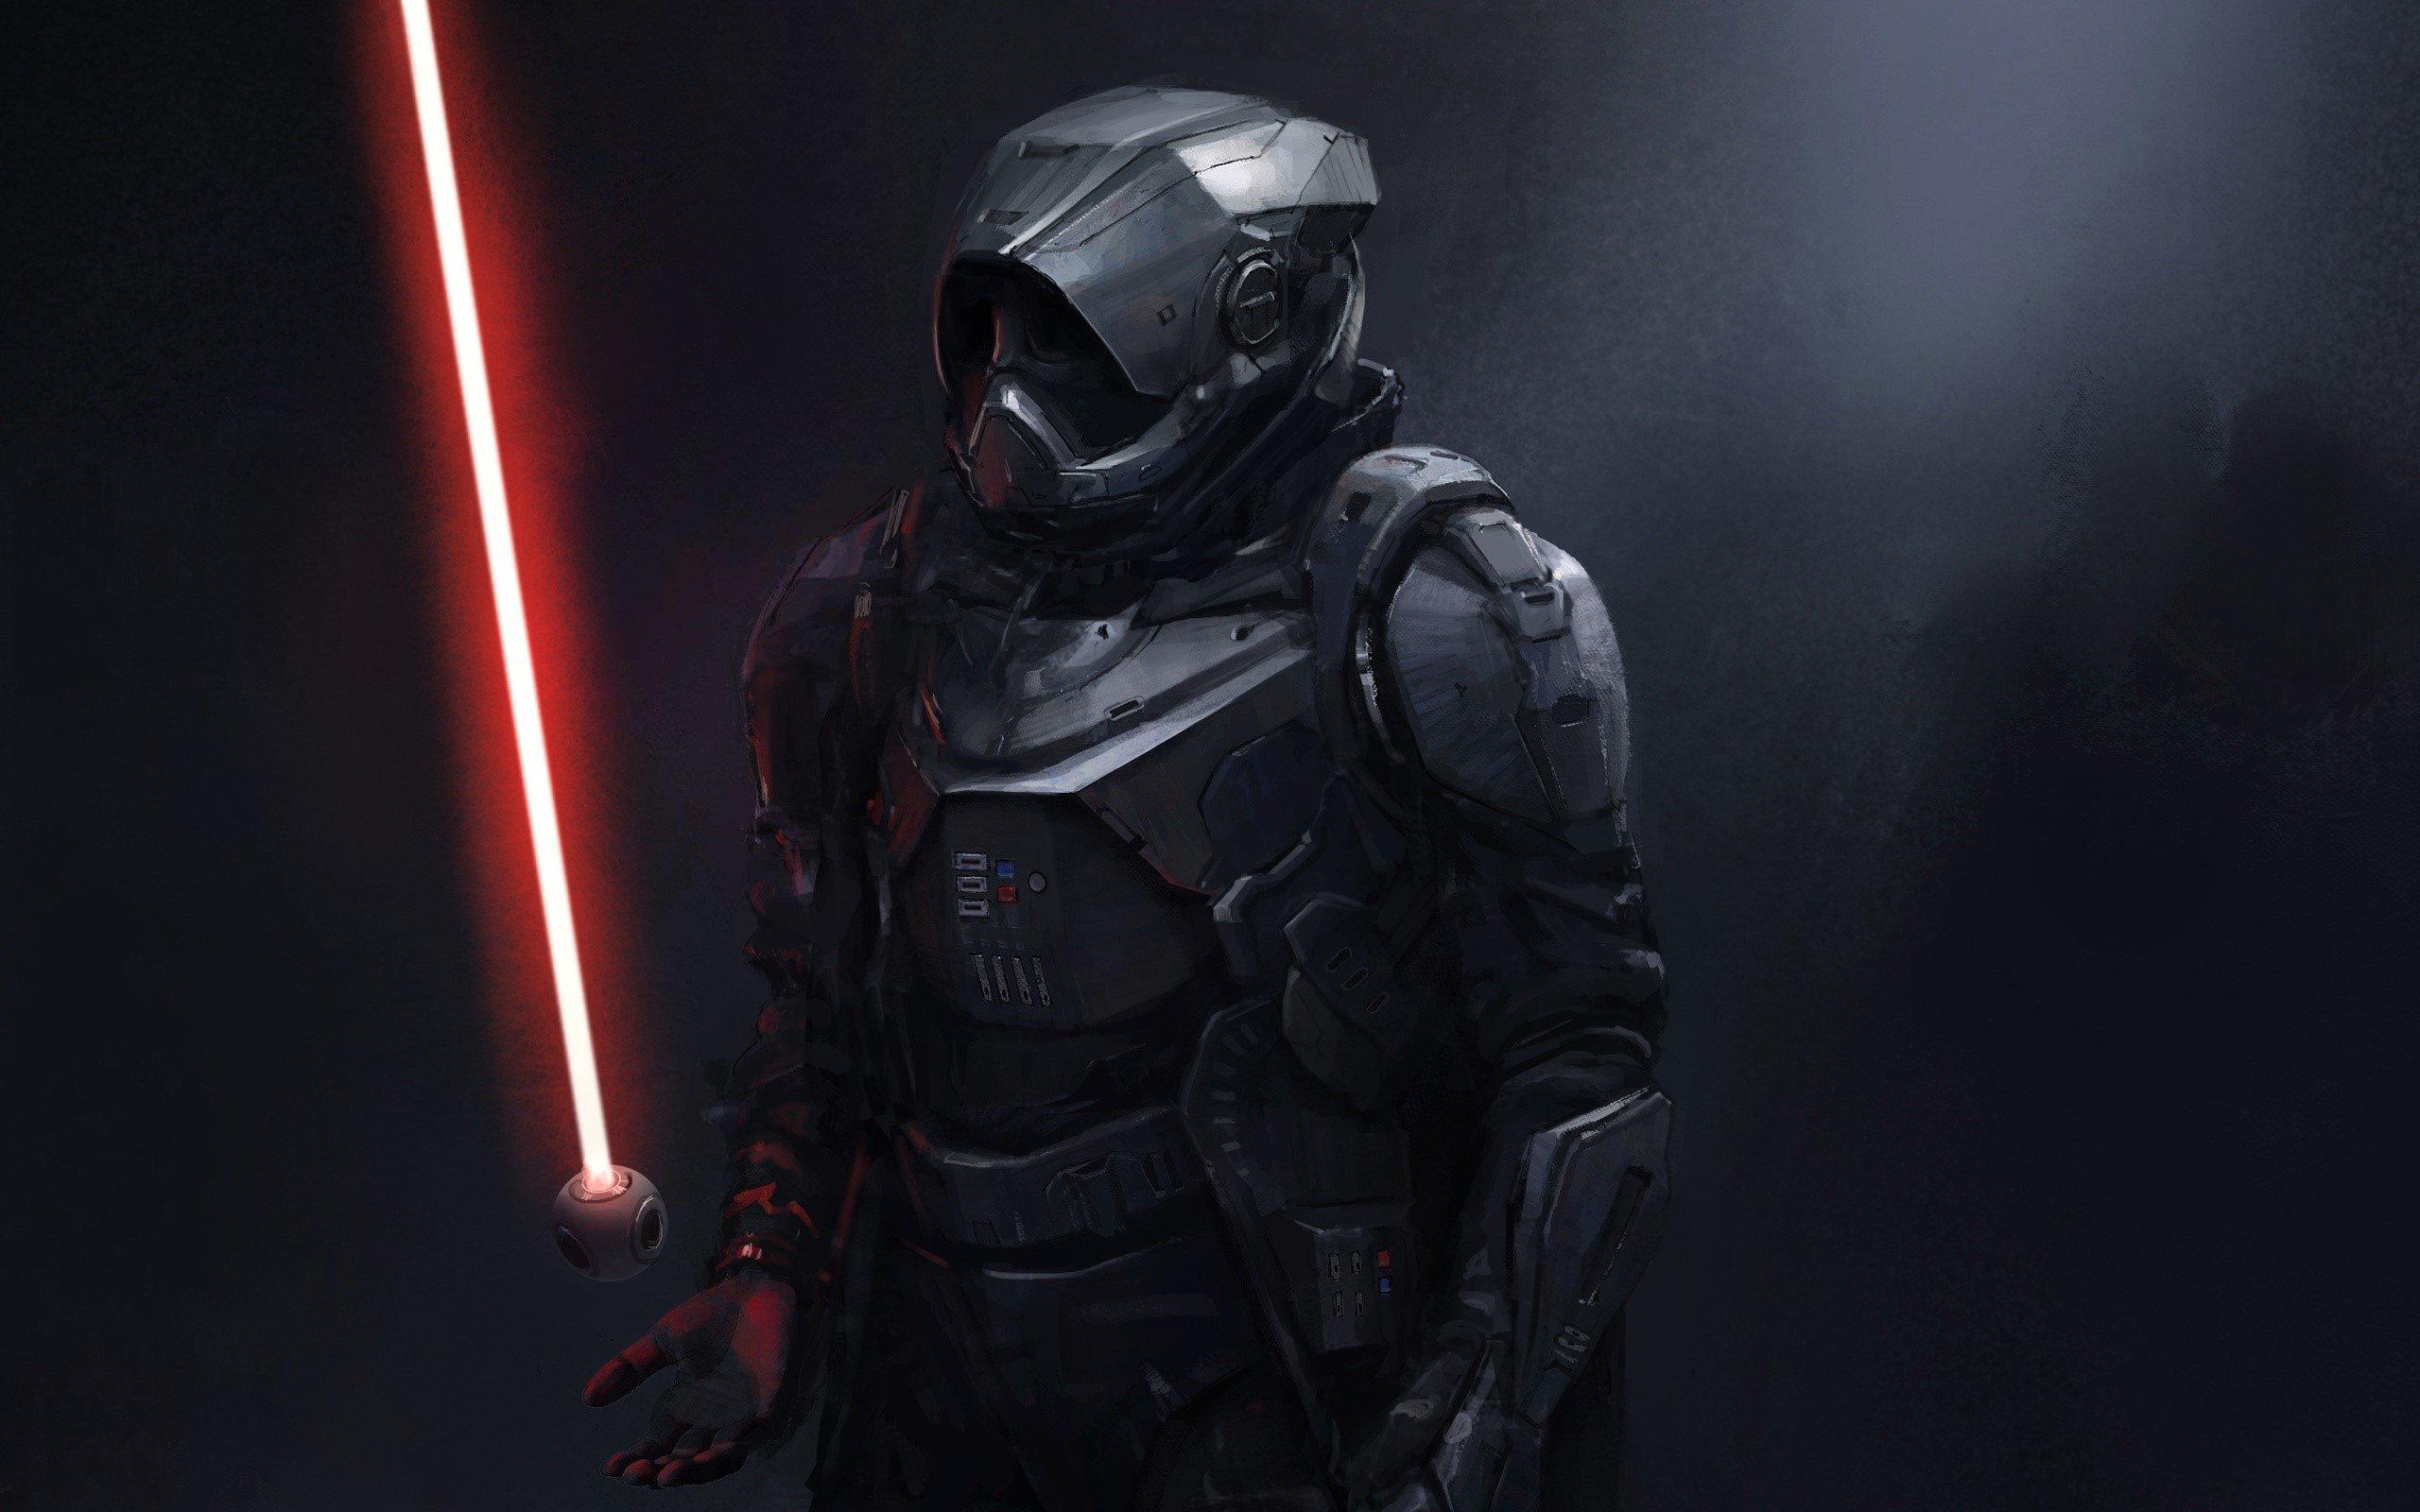 Wallpaper Darth Vader Anakin Skywalker